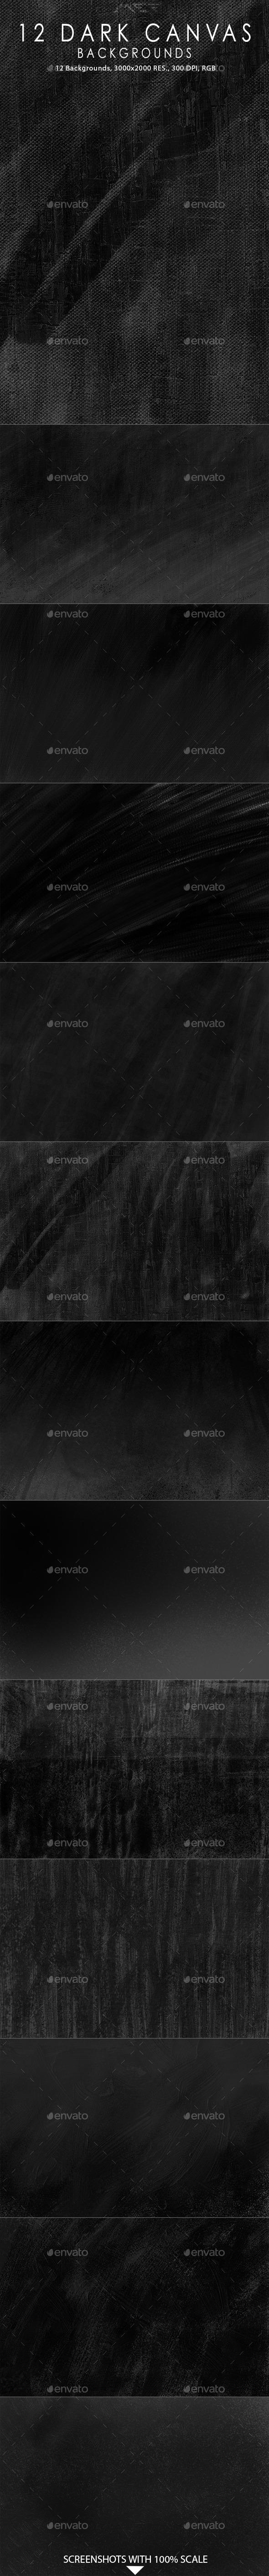 GraphicRiver 12 Dark Canvas Backgrounds 10360988